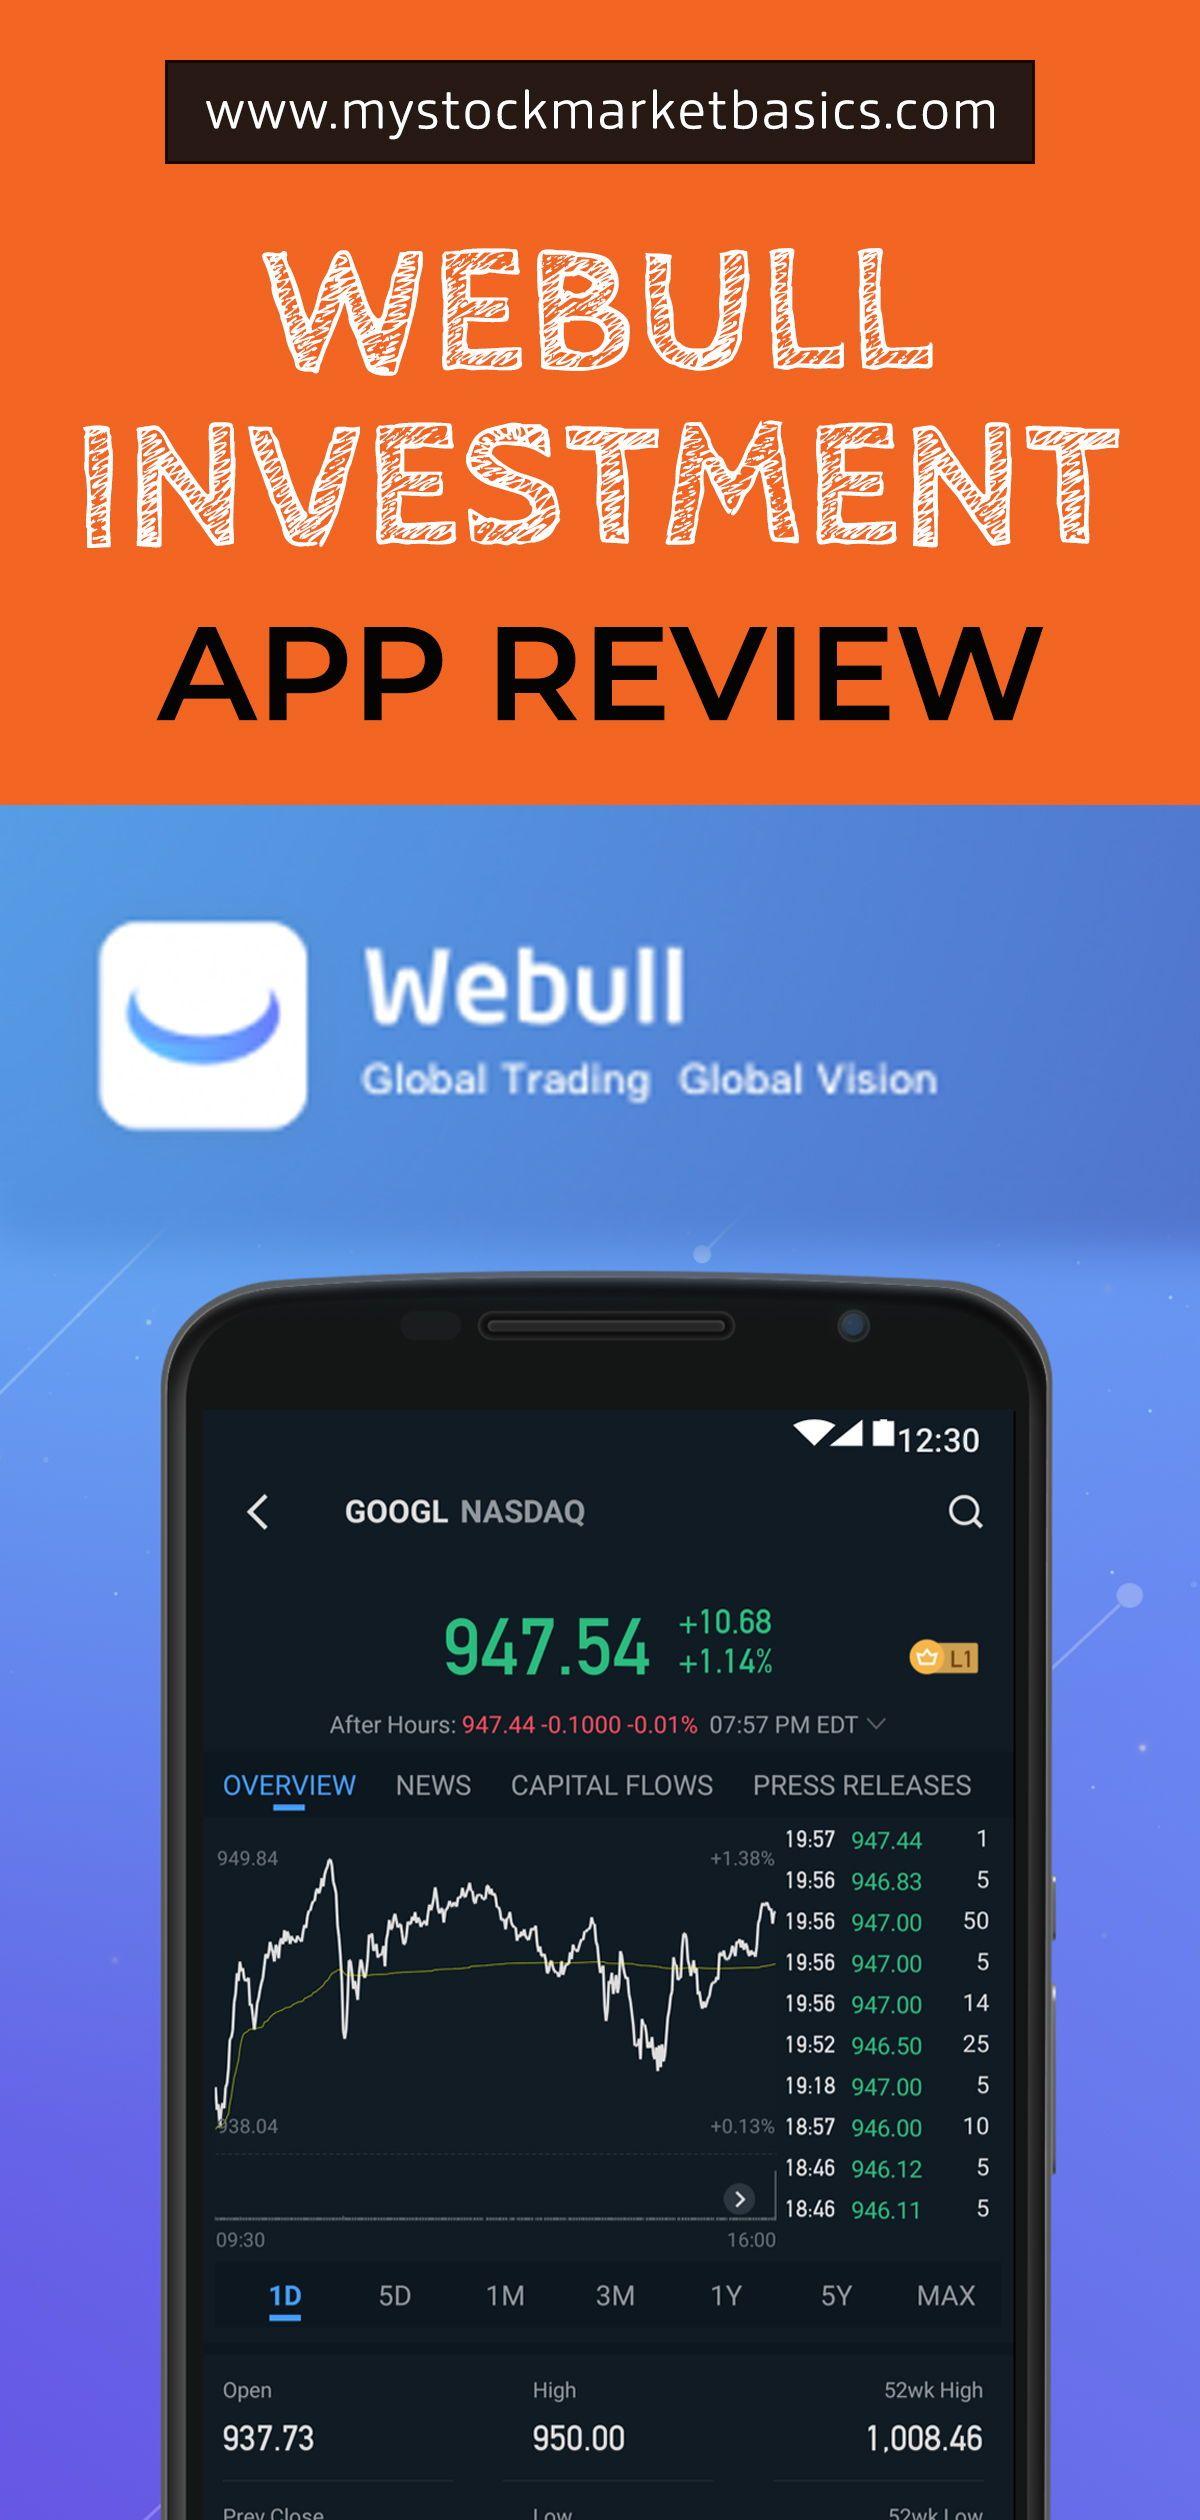 Investment App Comparison [Webull vs Robinhood vs M1